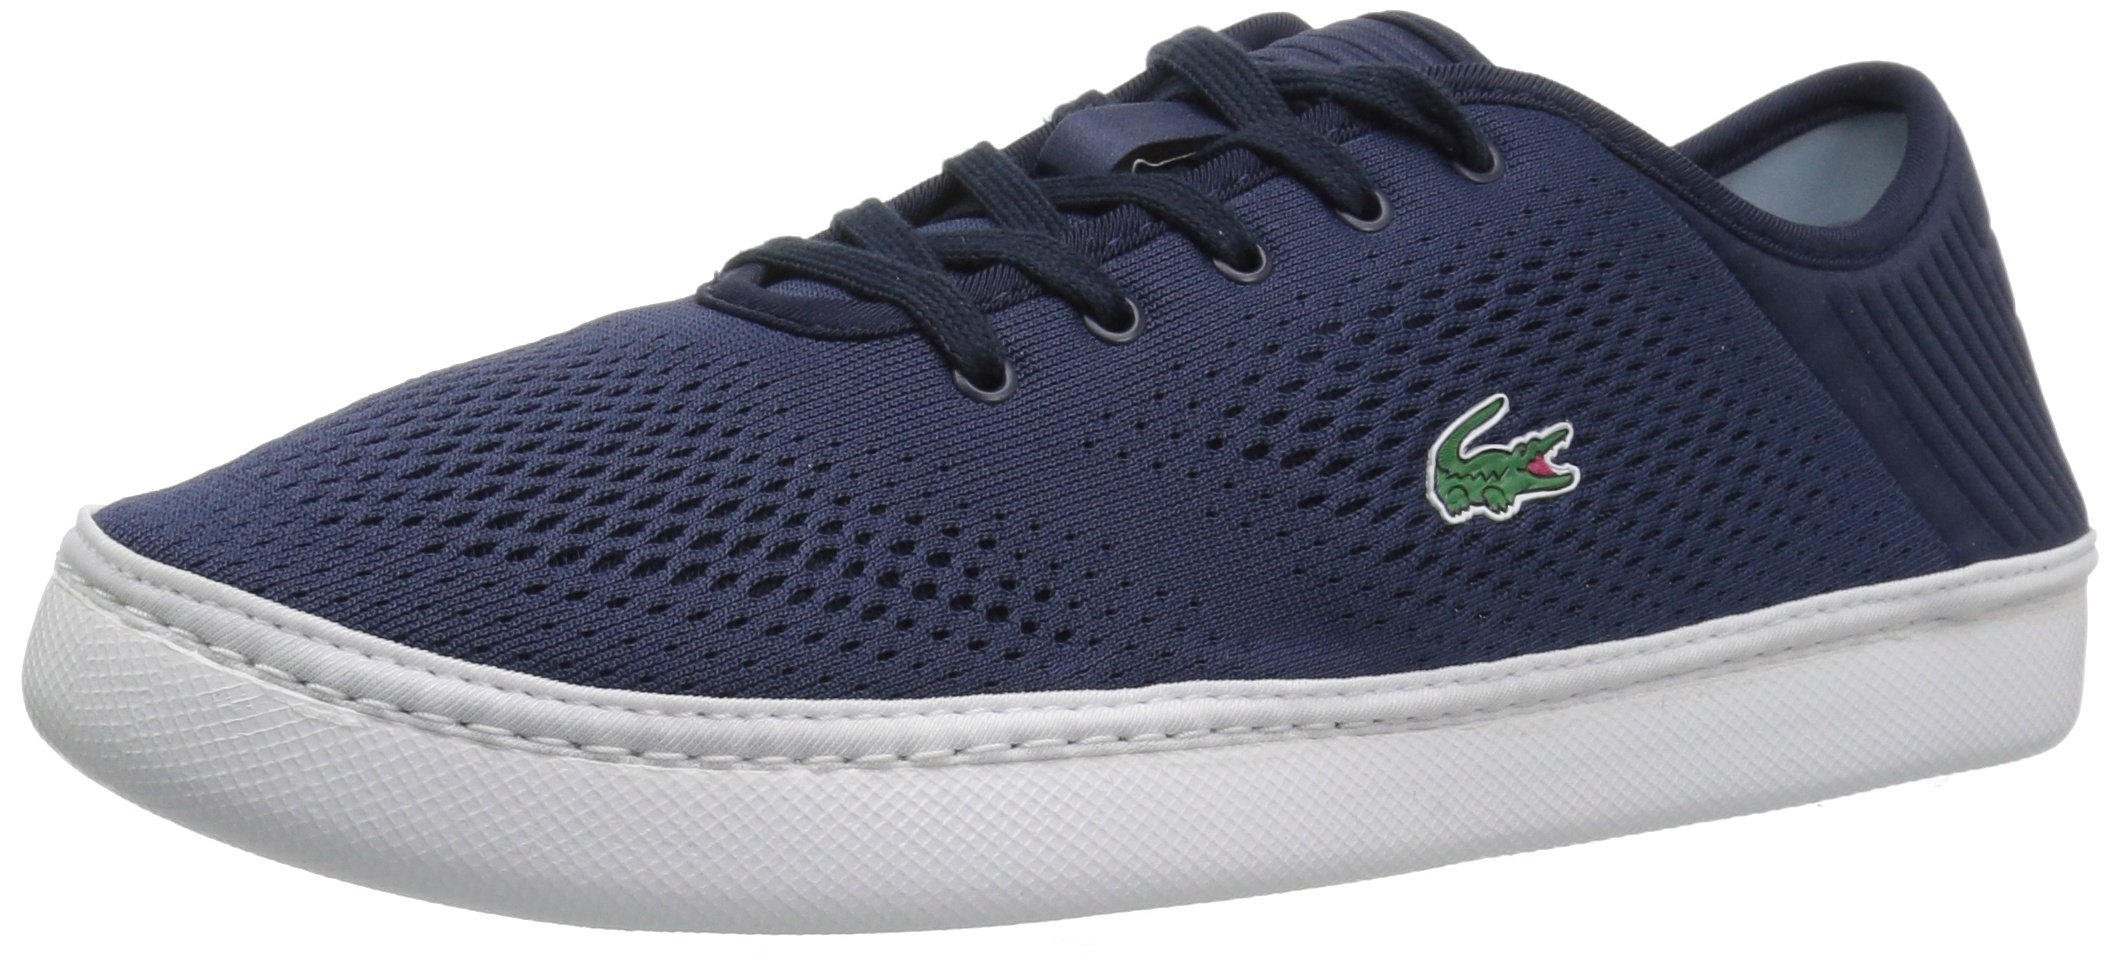 Lacoste Men's L.ydro Lace Sneakers,NVY/White Textile,10.5 M US